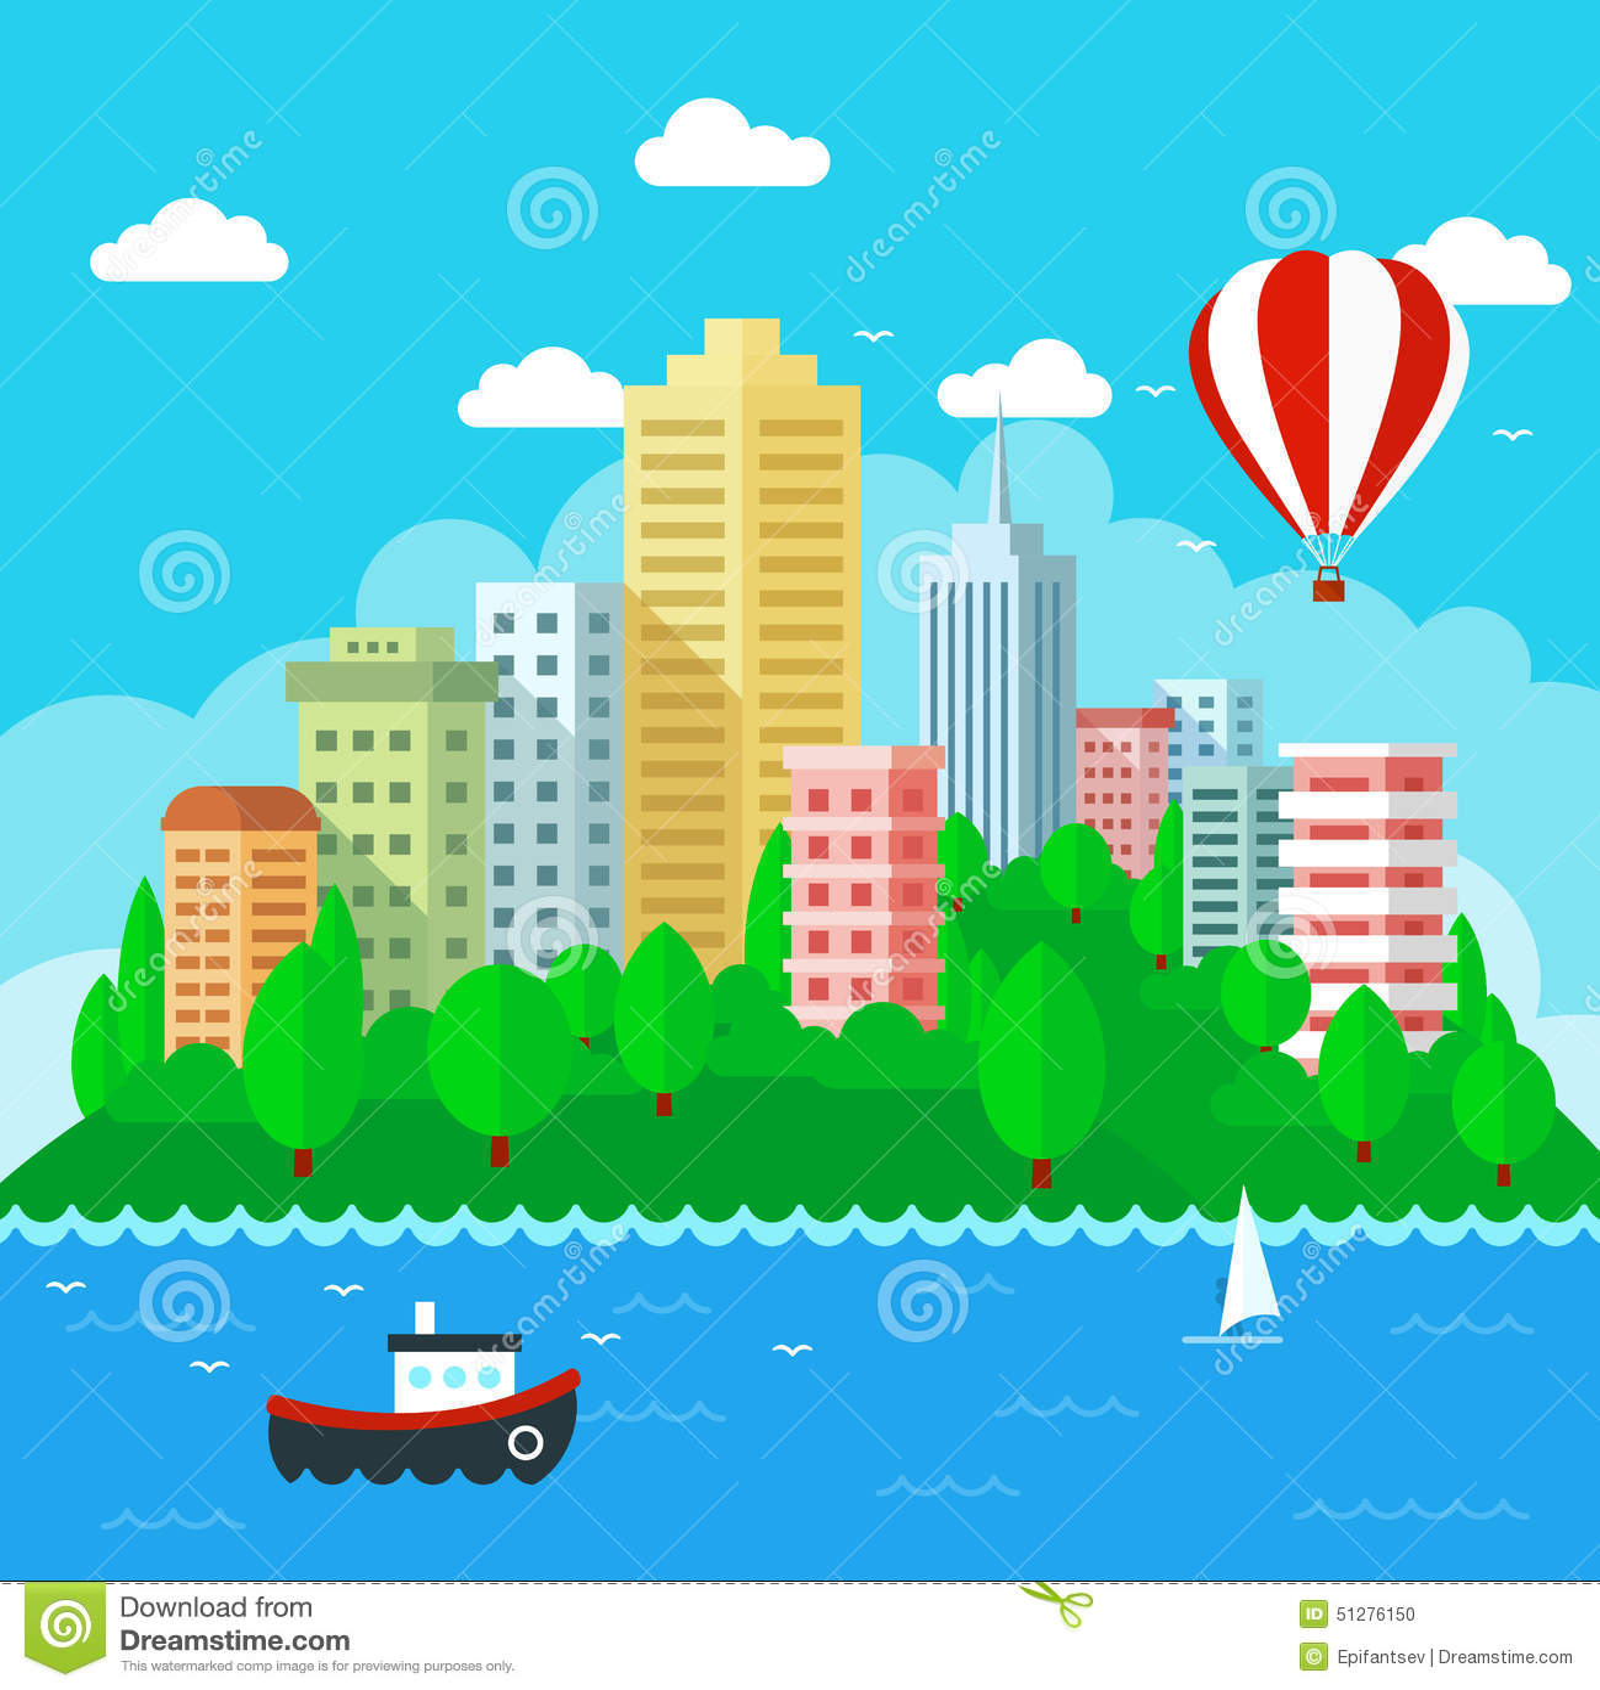 Town Landscape Vector Illustration: Urban Landscape In Flat Style Design. Vector Illustration